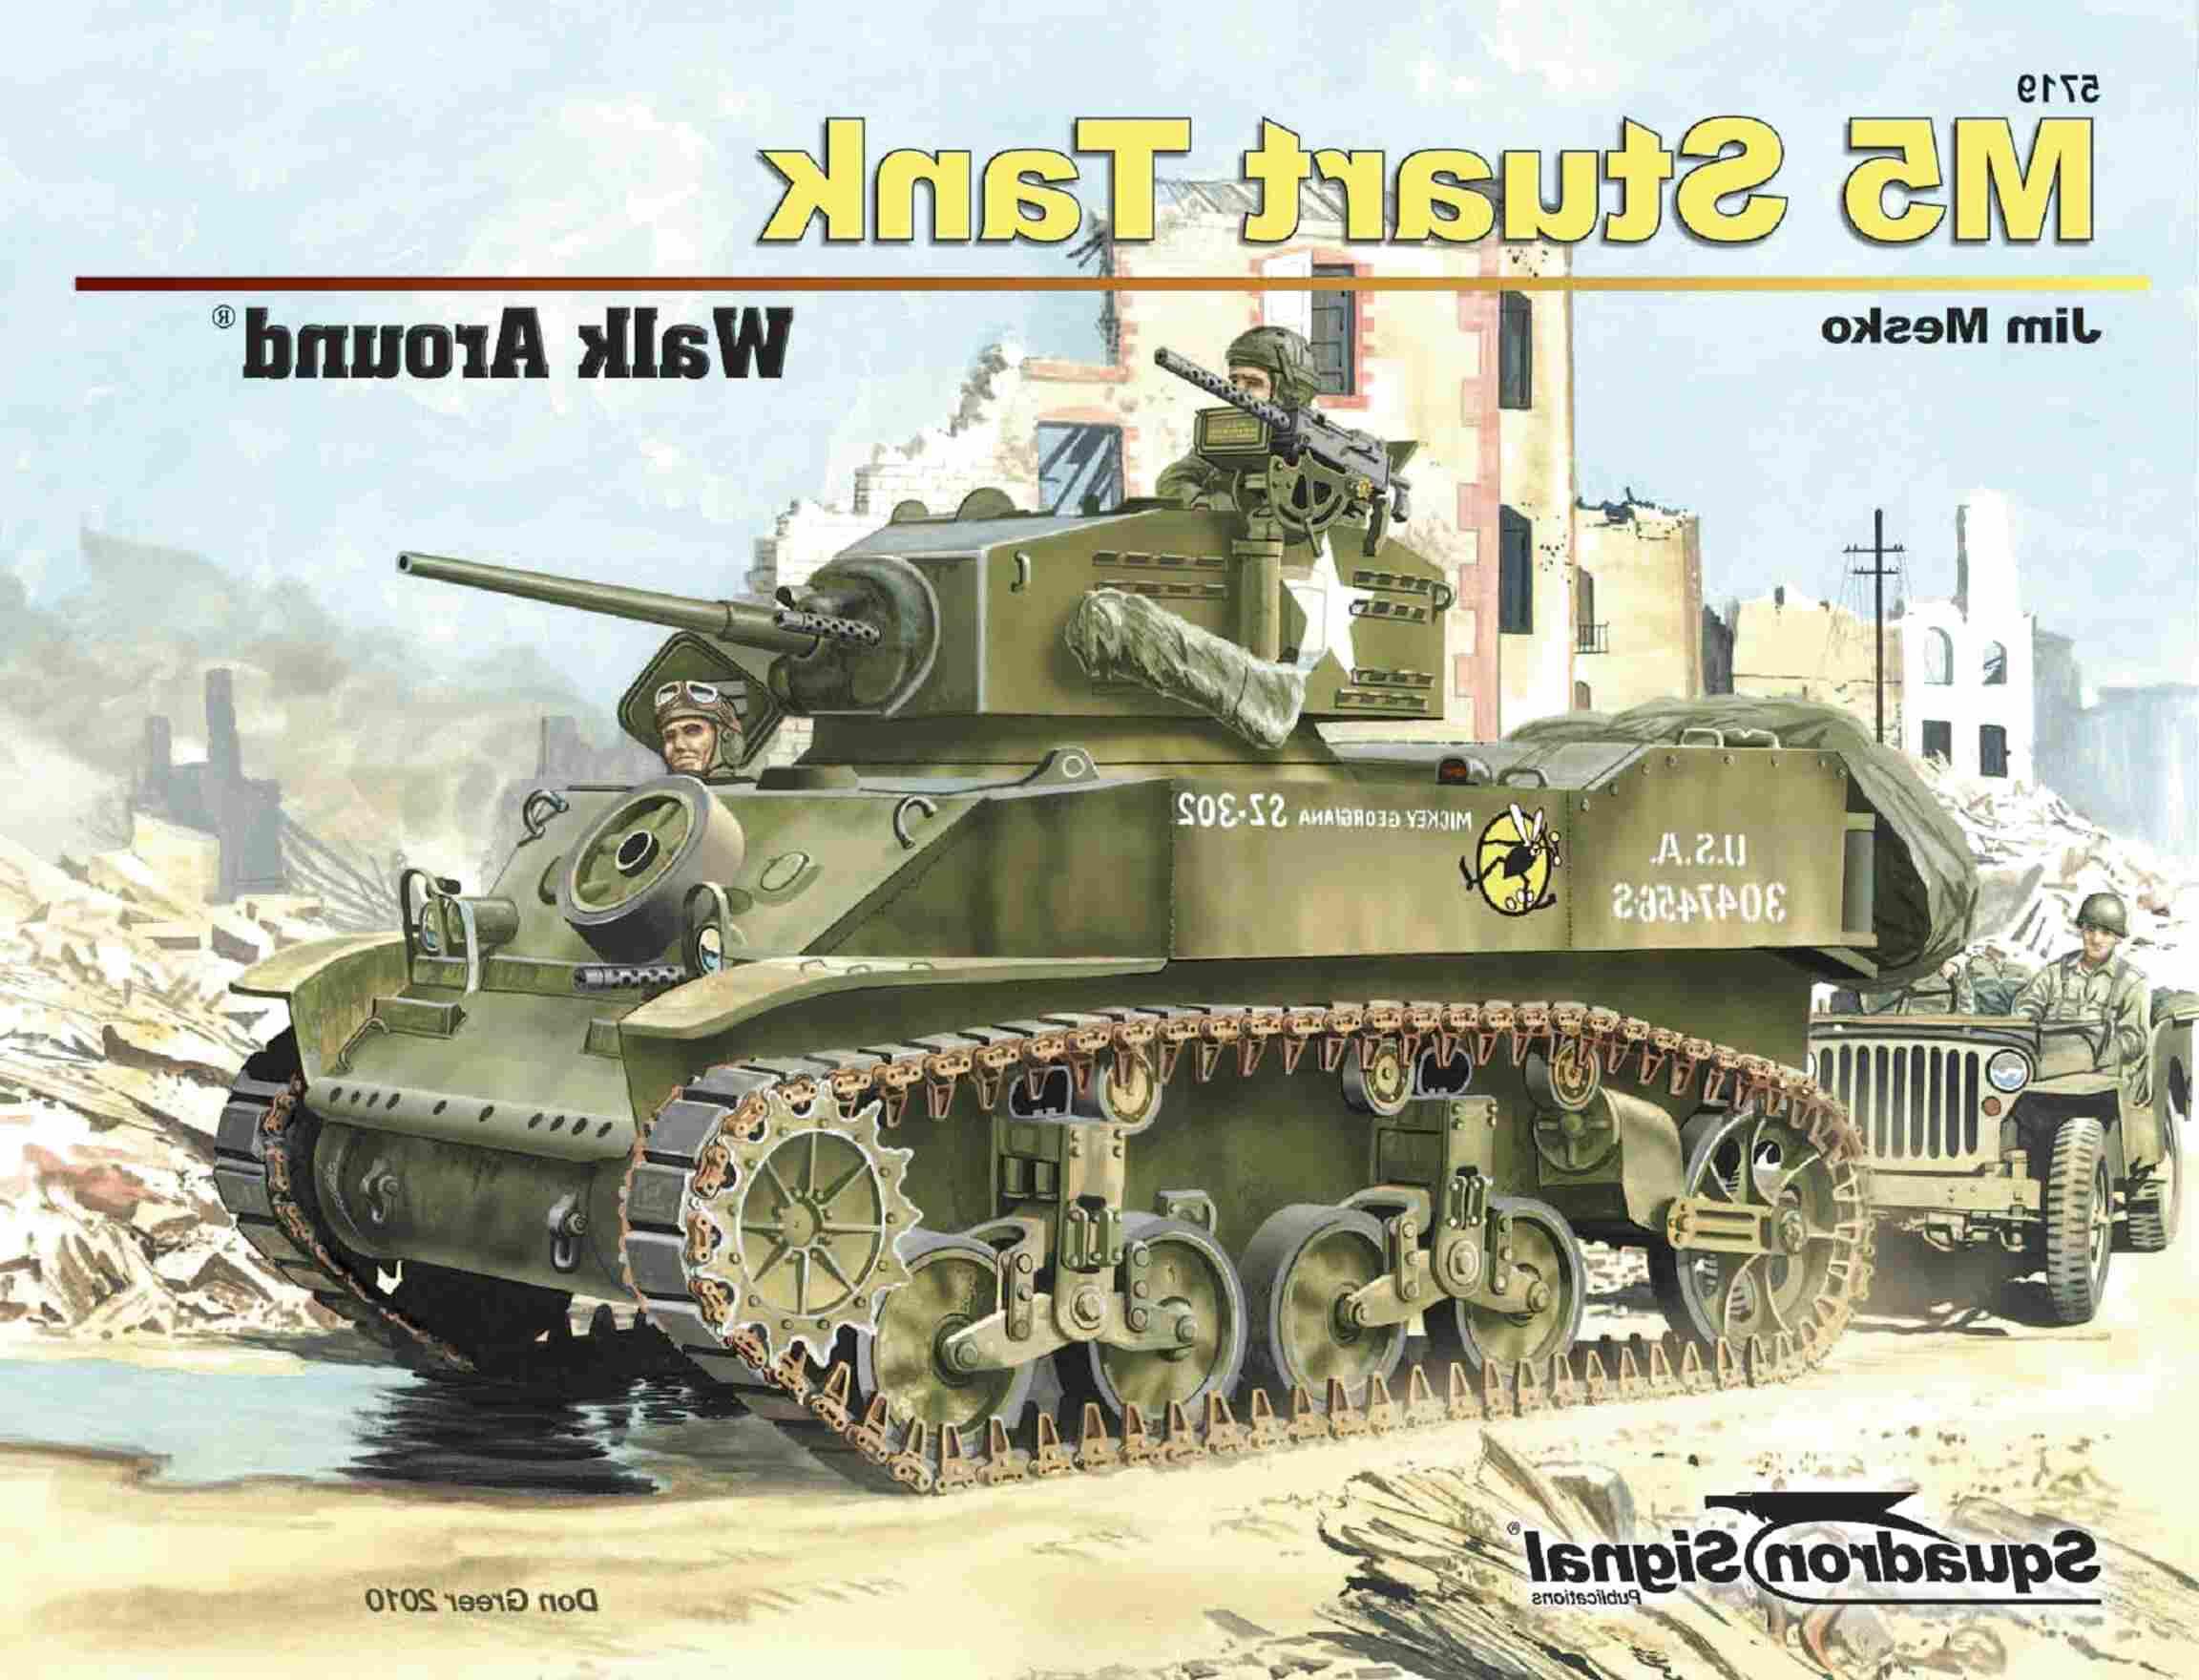 m5 stuart tank for sale